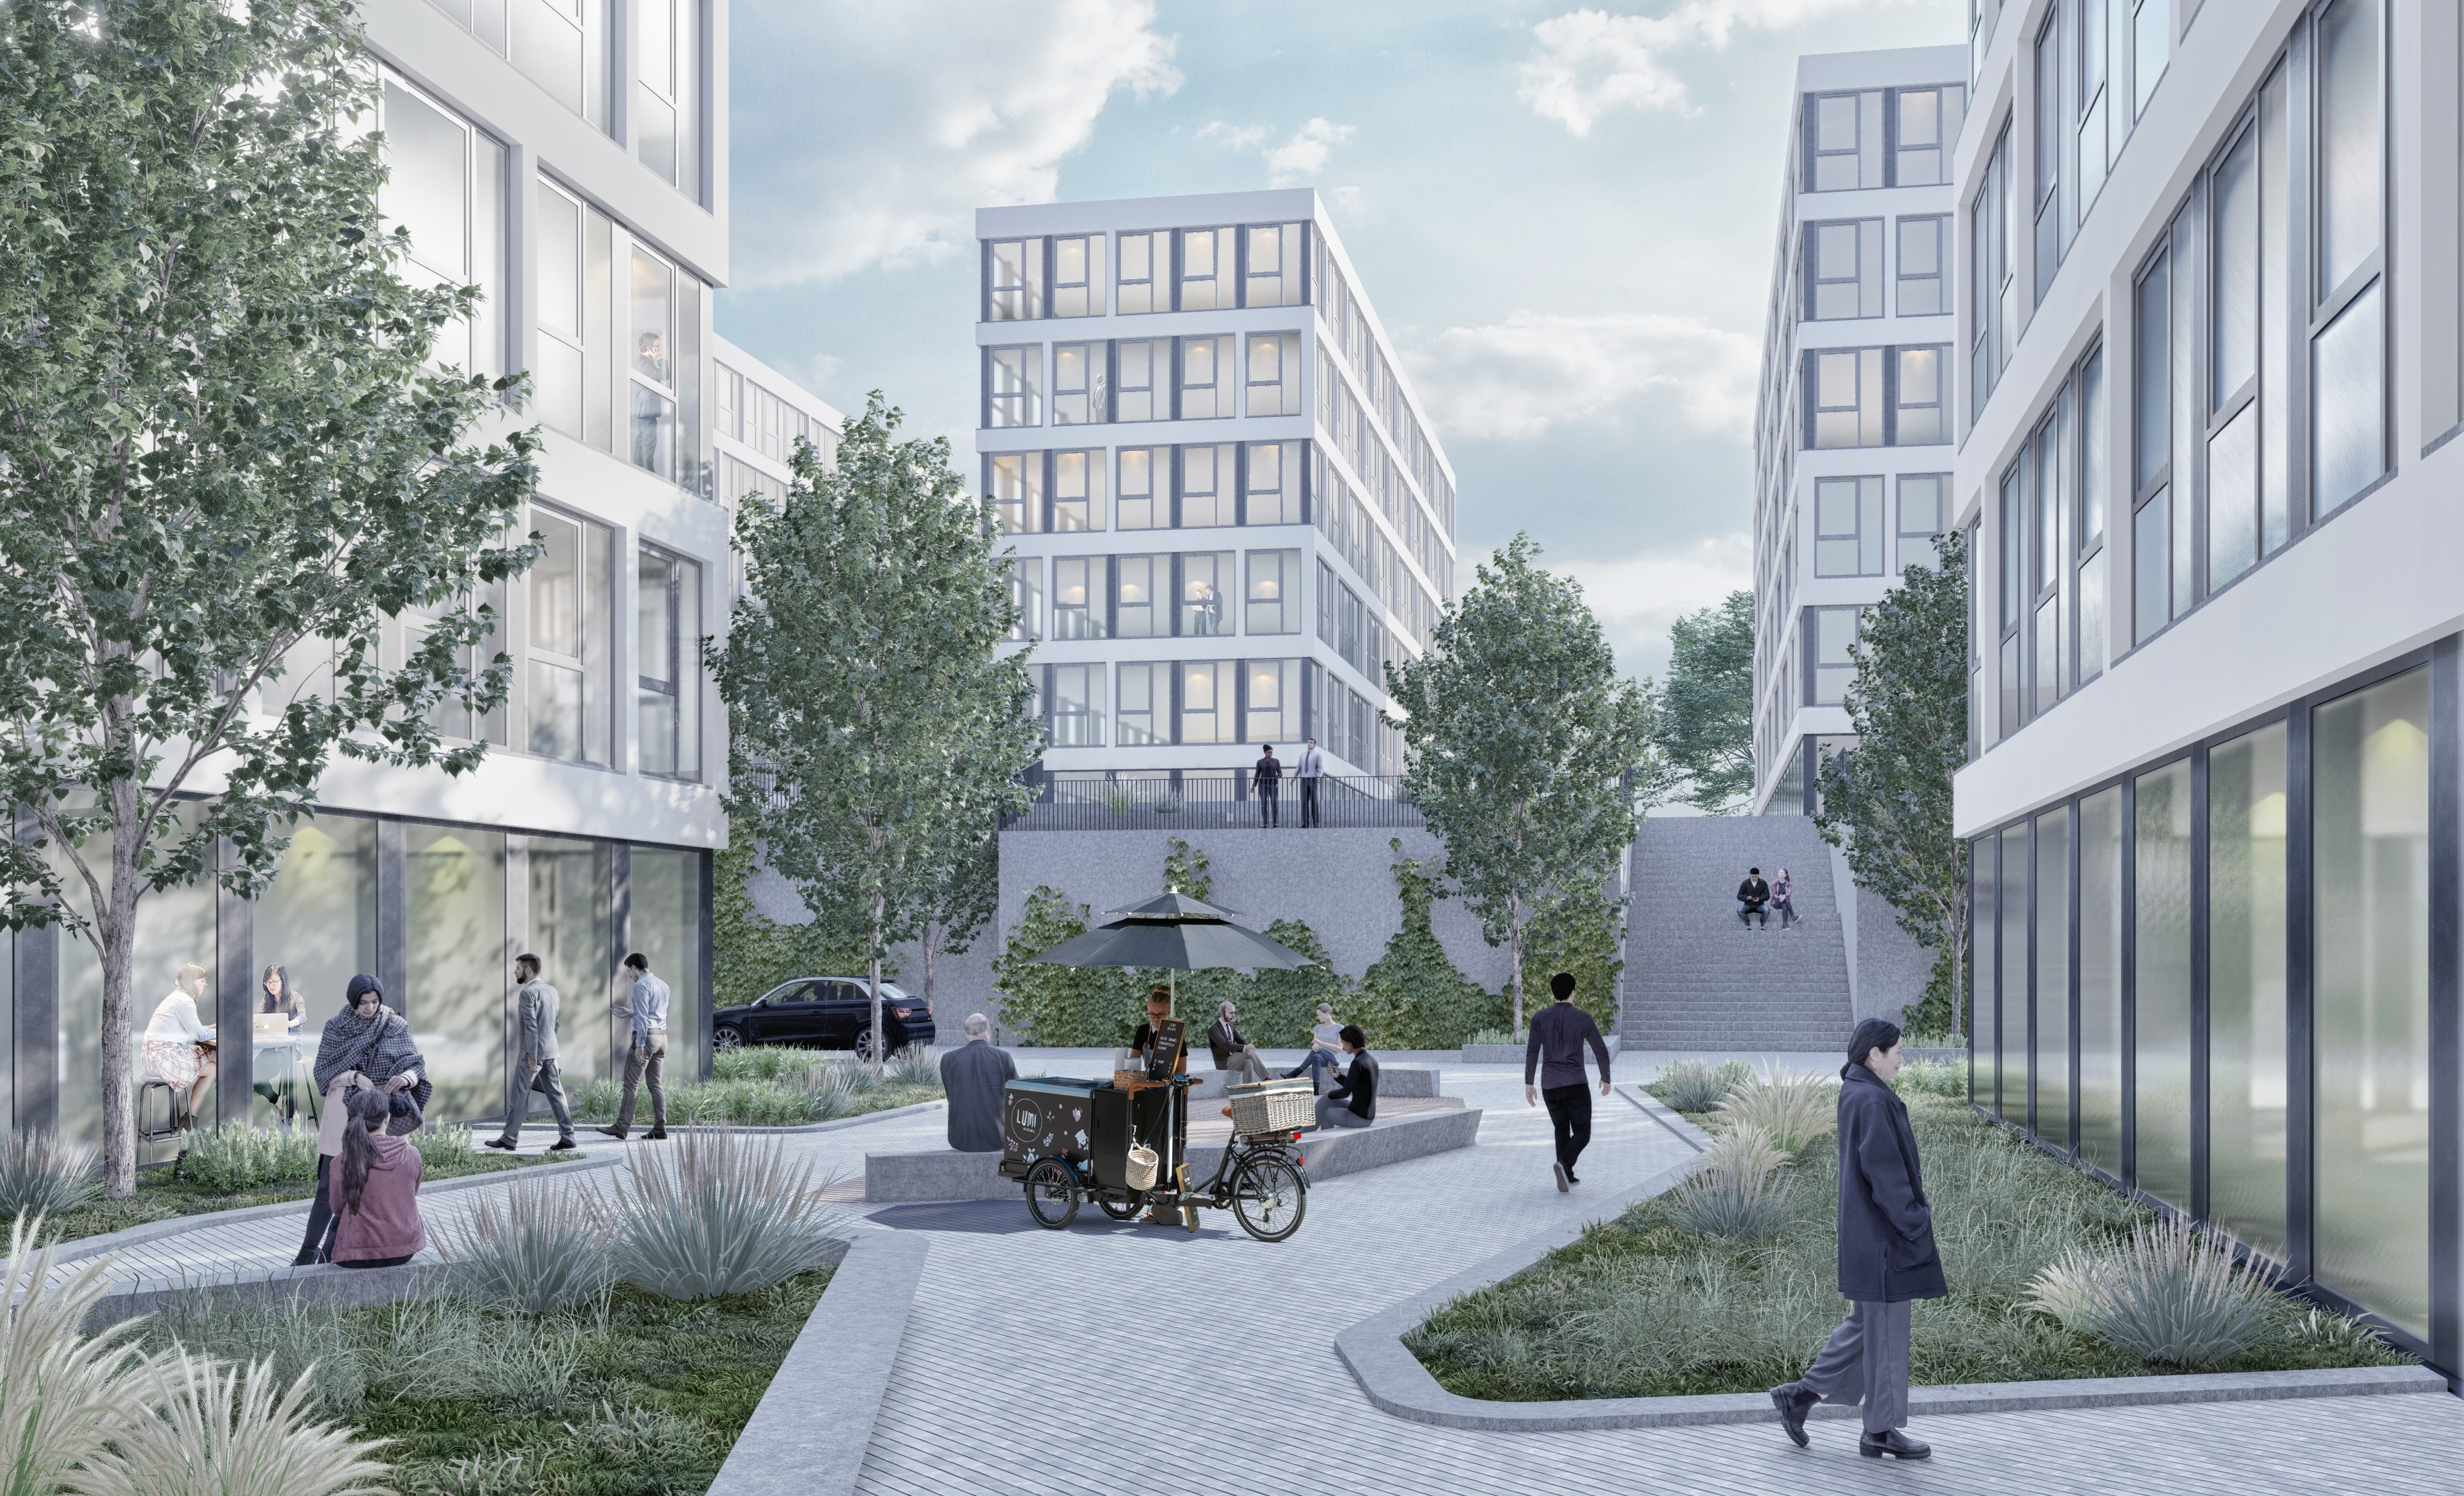 Juli 2021 - Neubau in Bochum bietet 17.000 m² Mietfläche